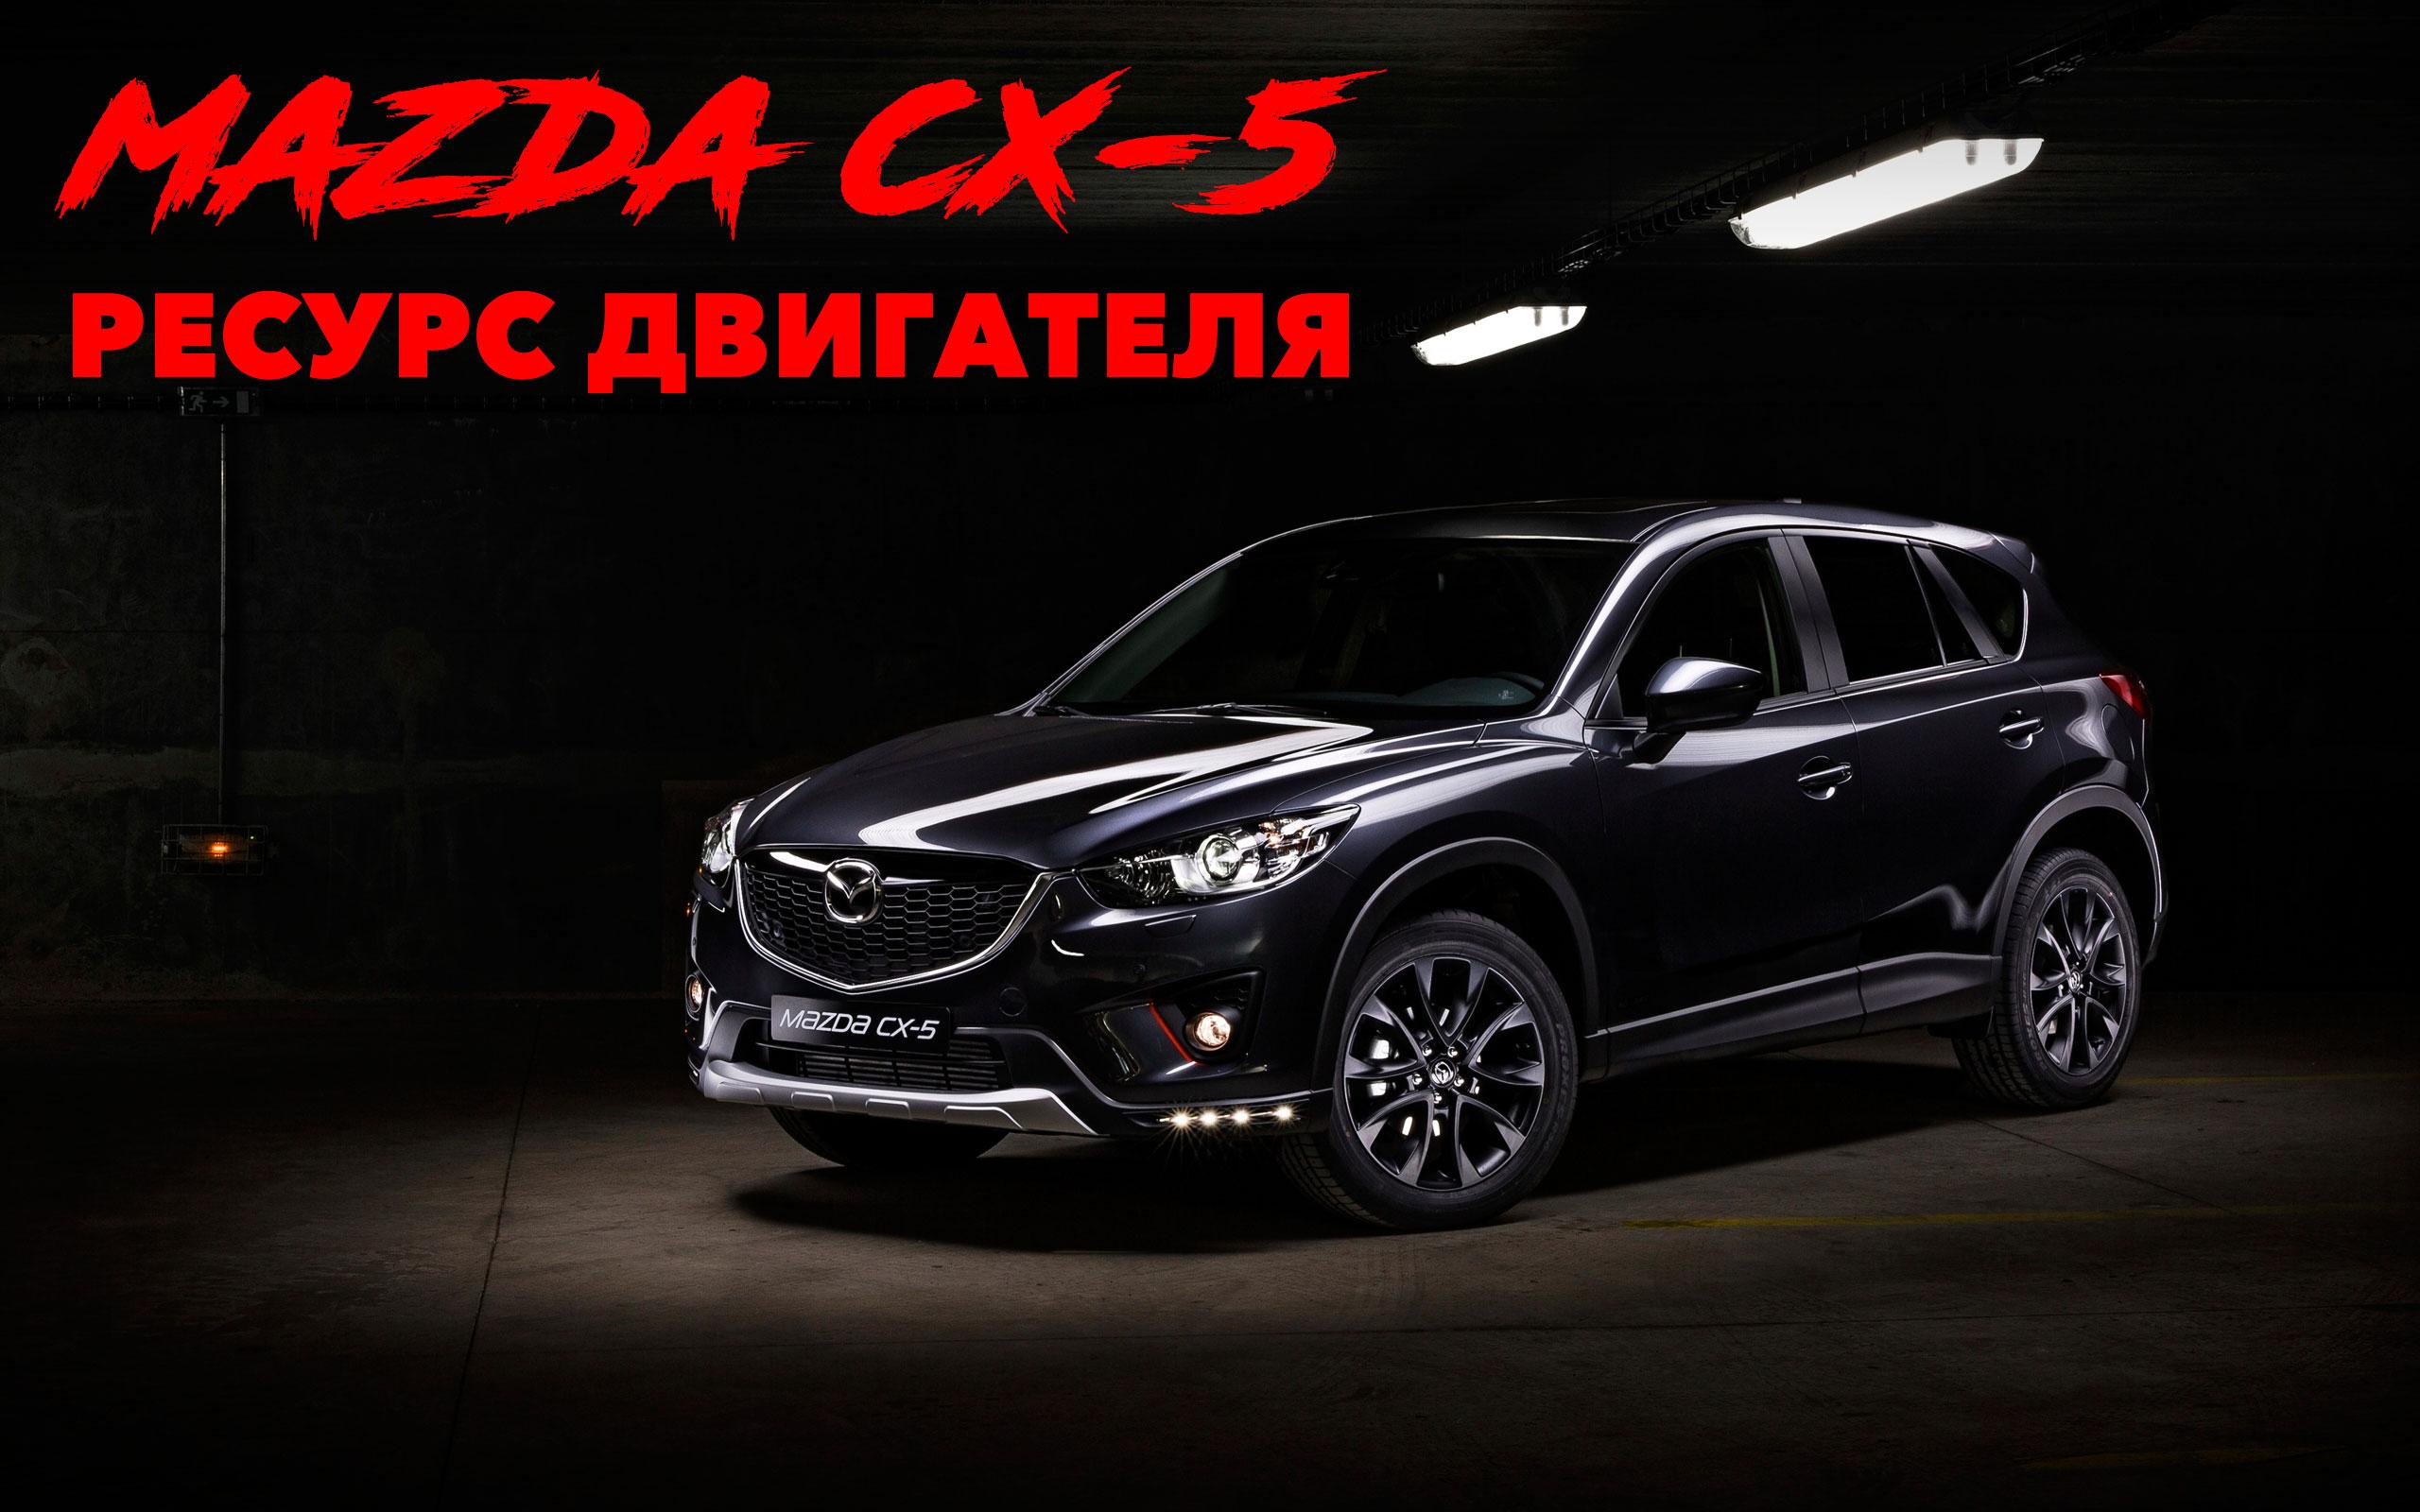 Ресурс двигателя Mazda CX-5 2.0, 2.2, 2.5